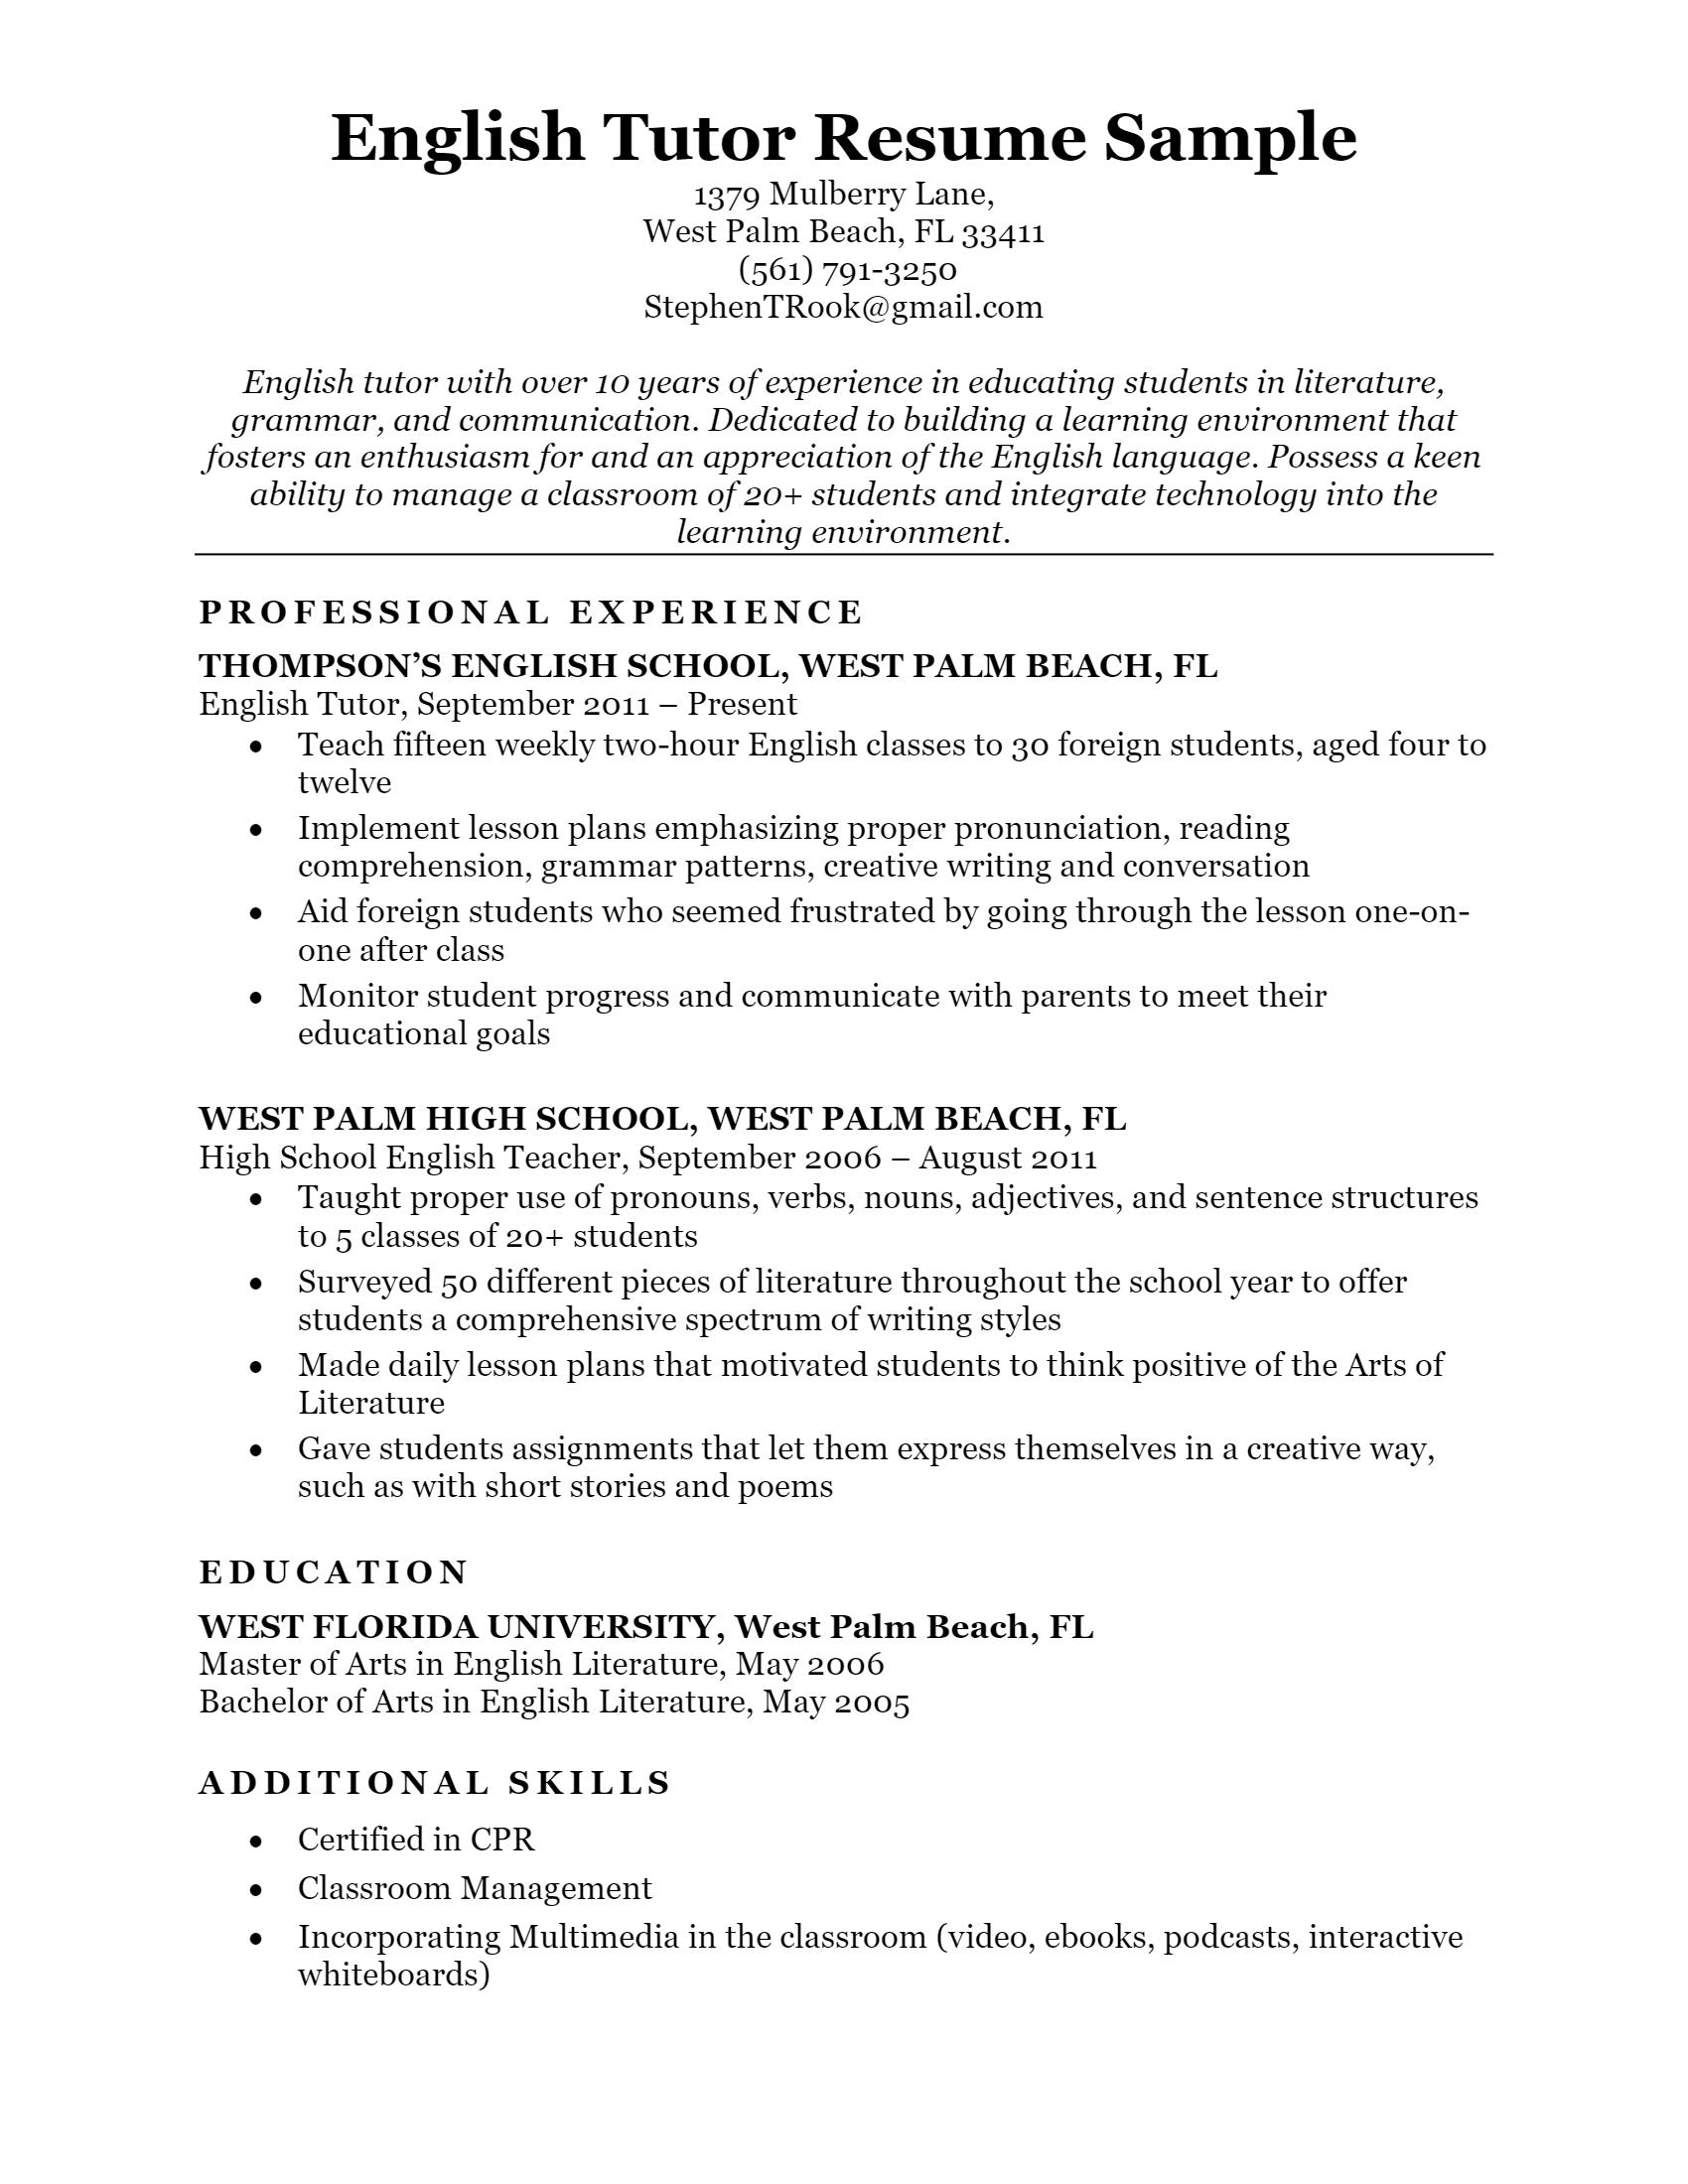 Tutor Resume > Tutor Resume .Docx (Word)